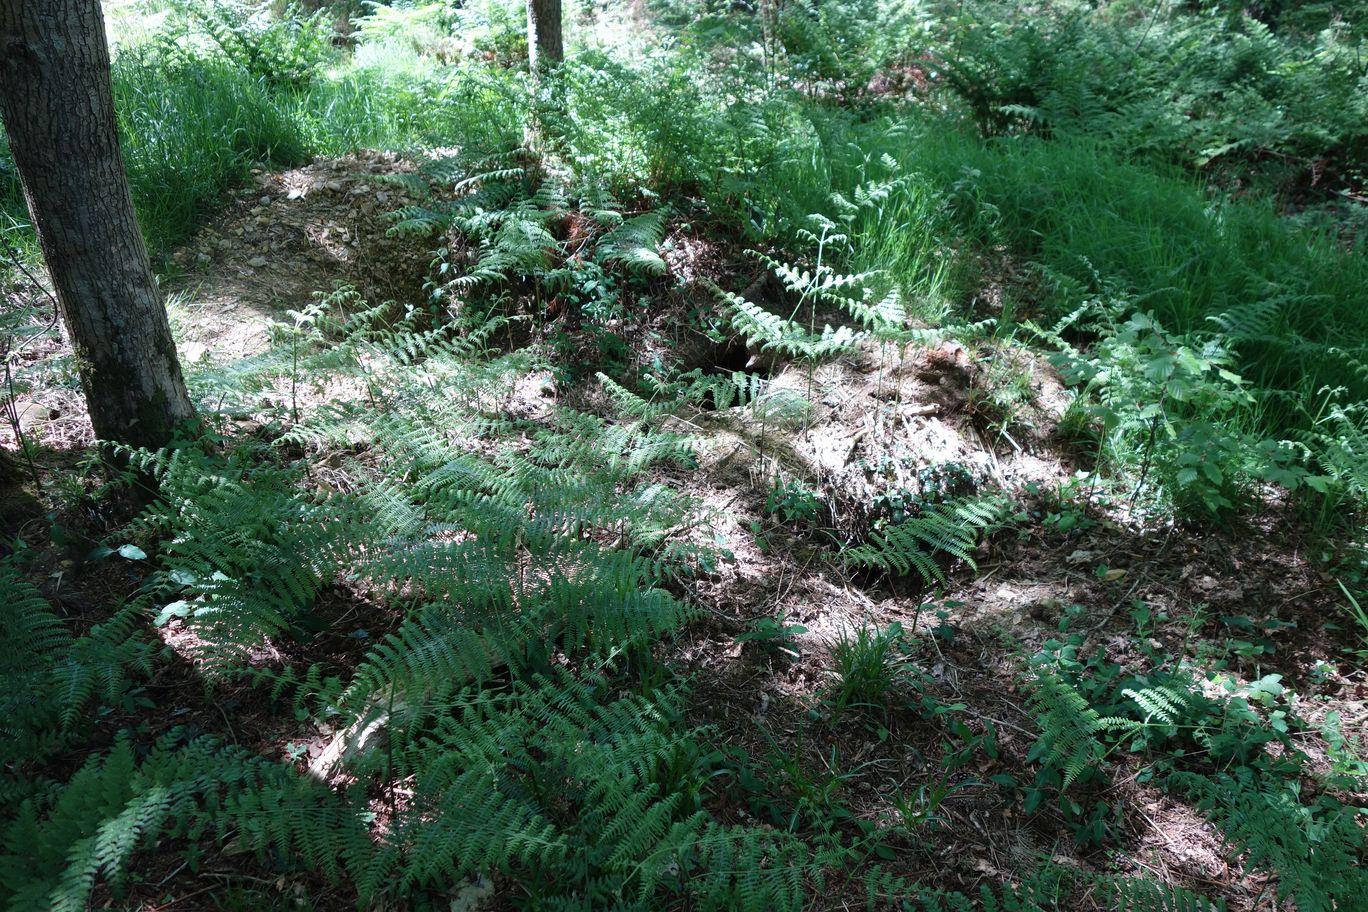 Overgrown sett